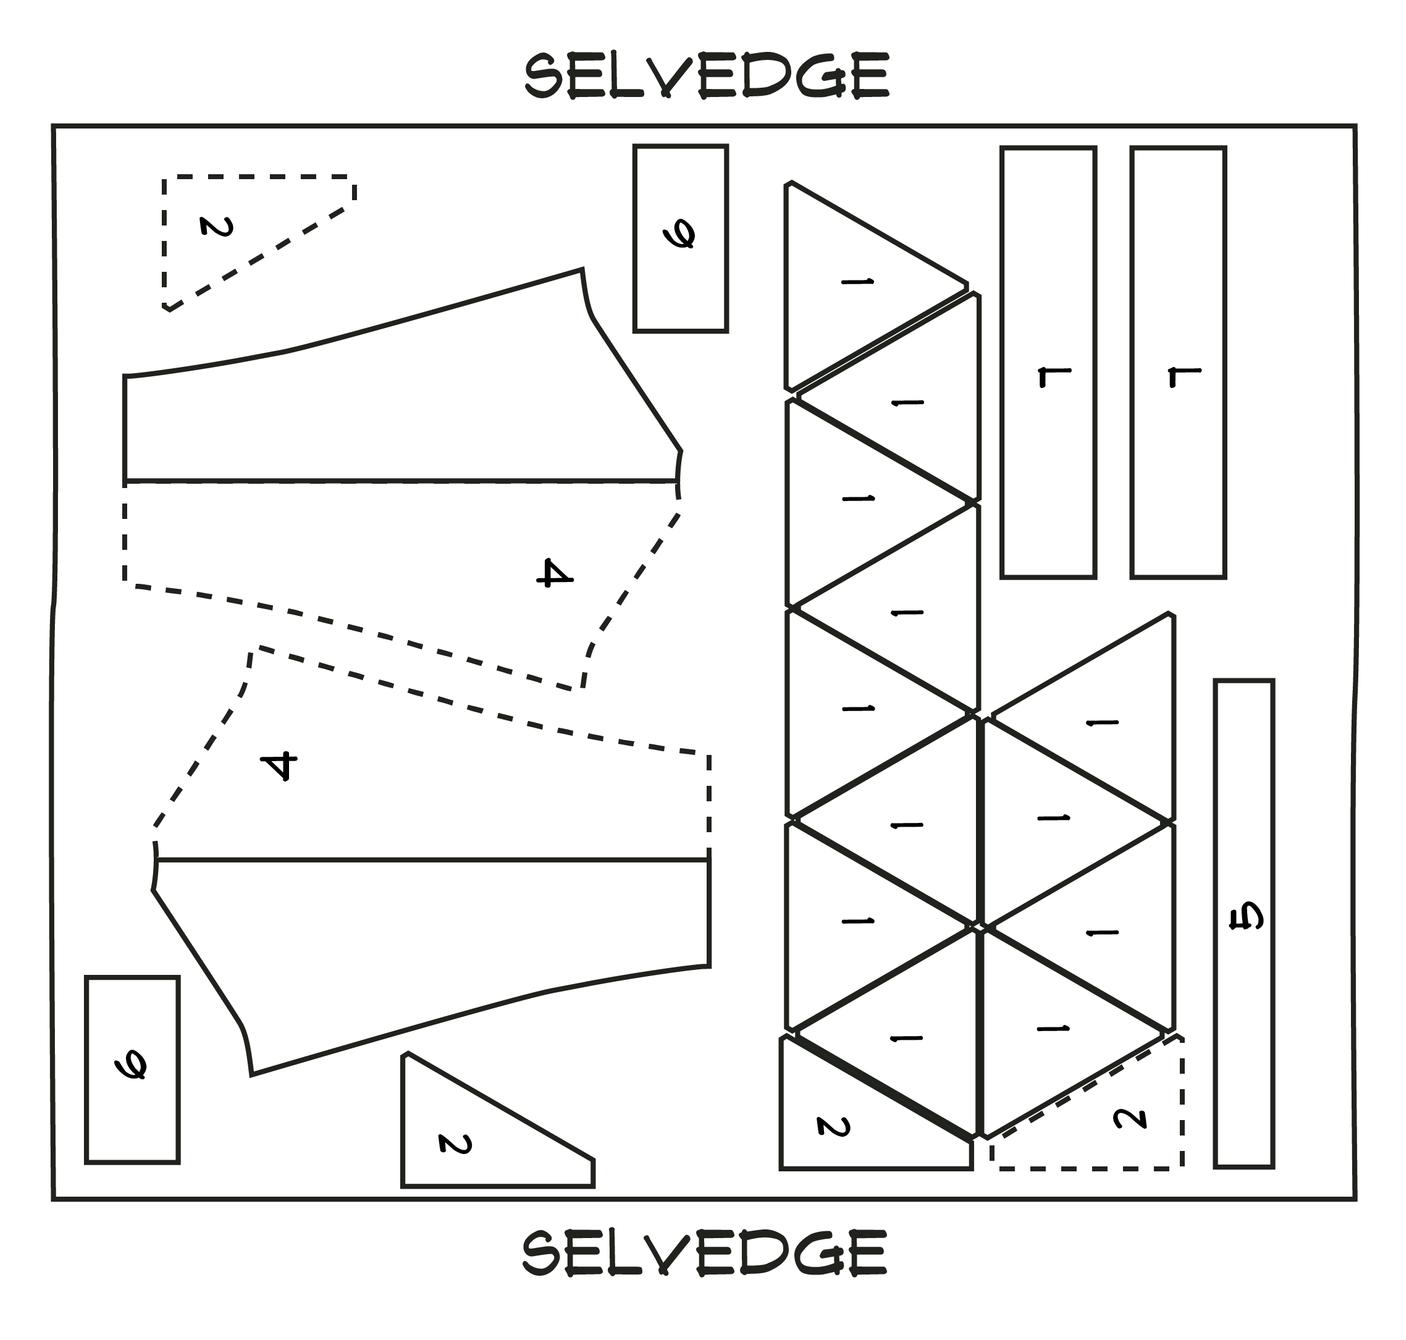 layout_12-13-16_v1-54-ah.png